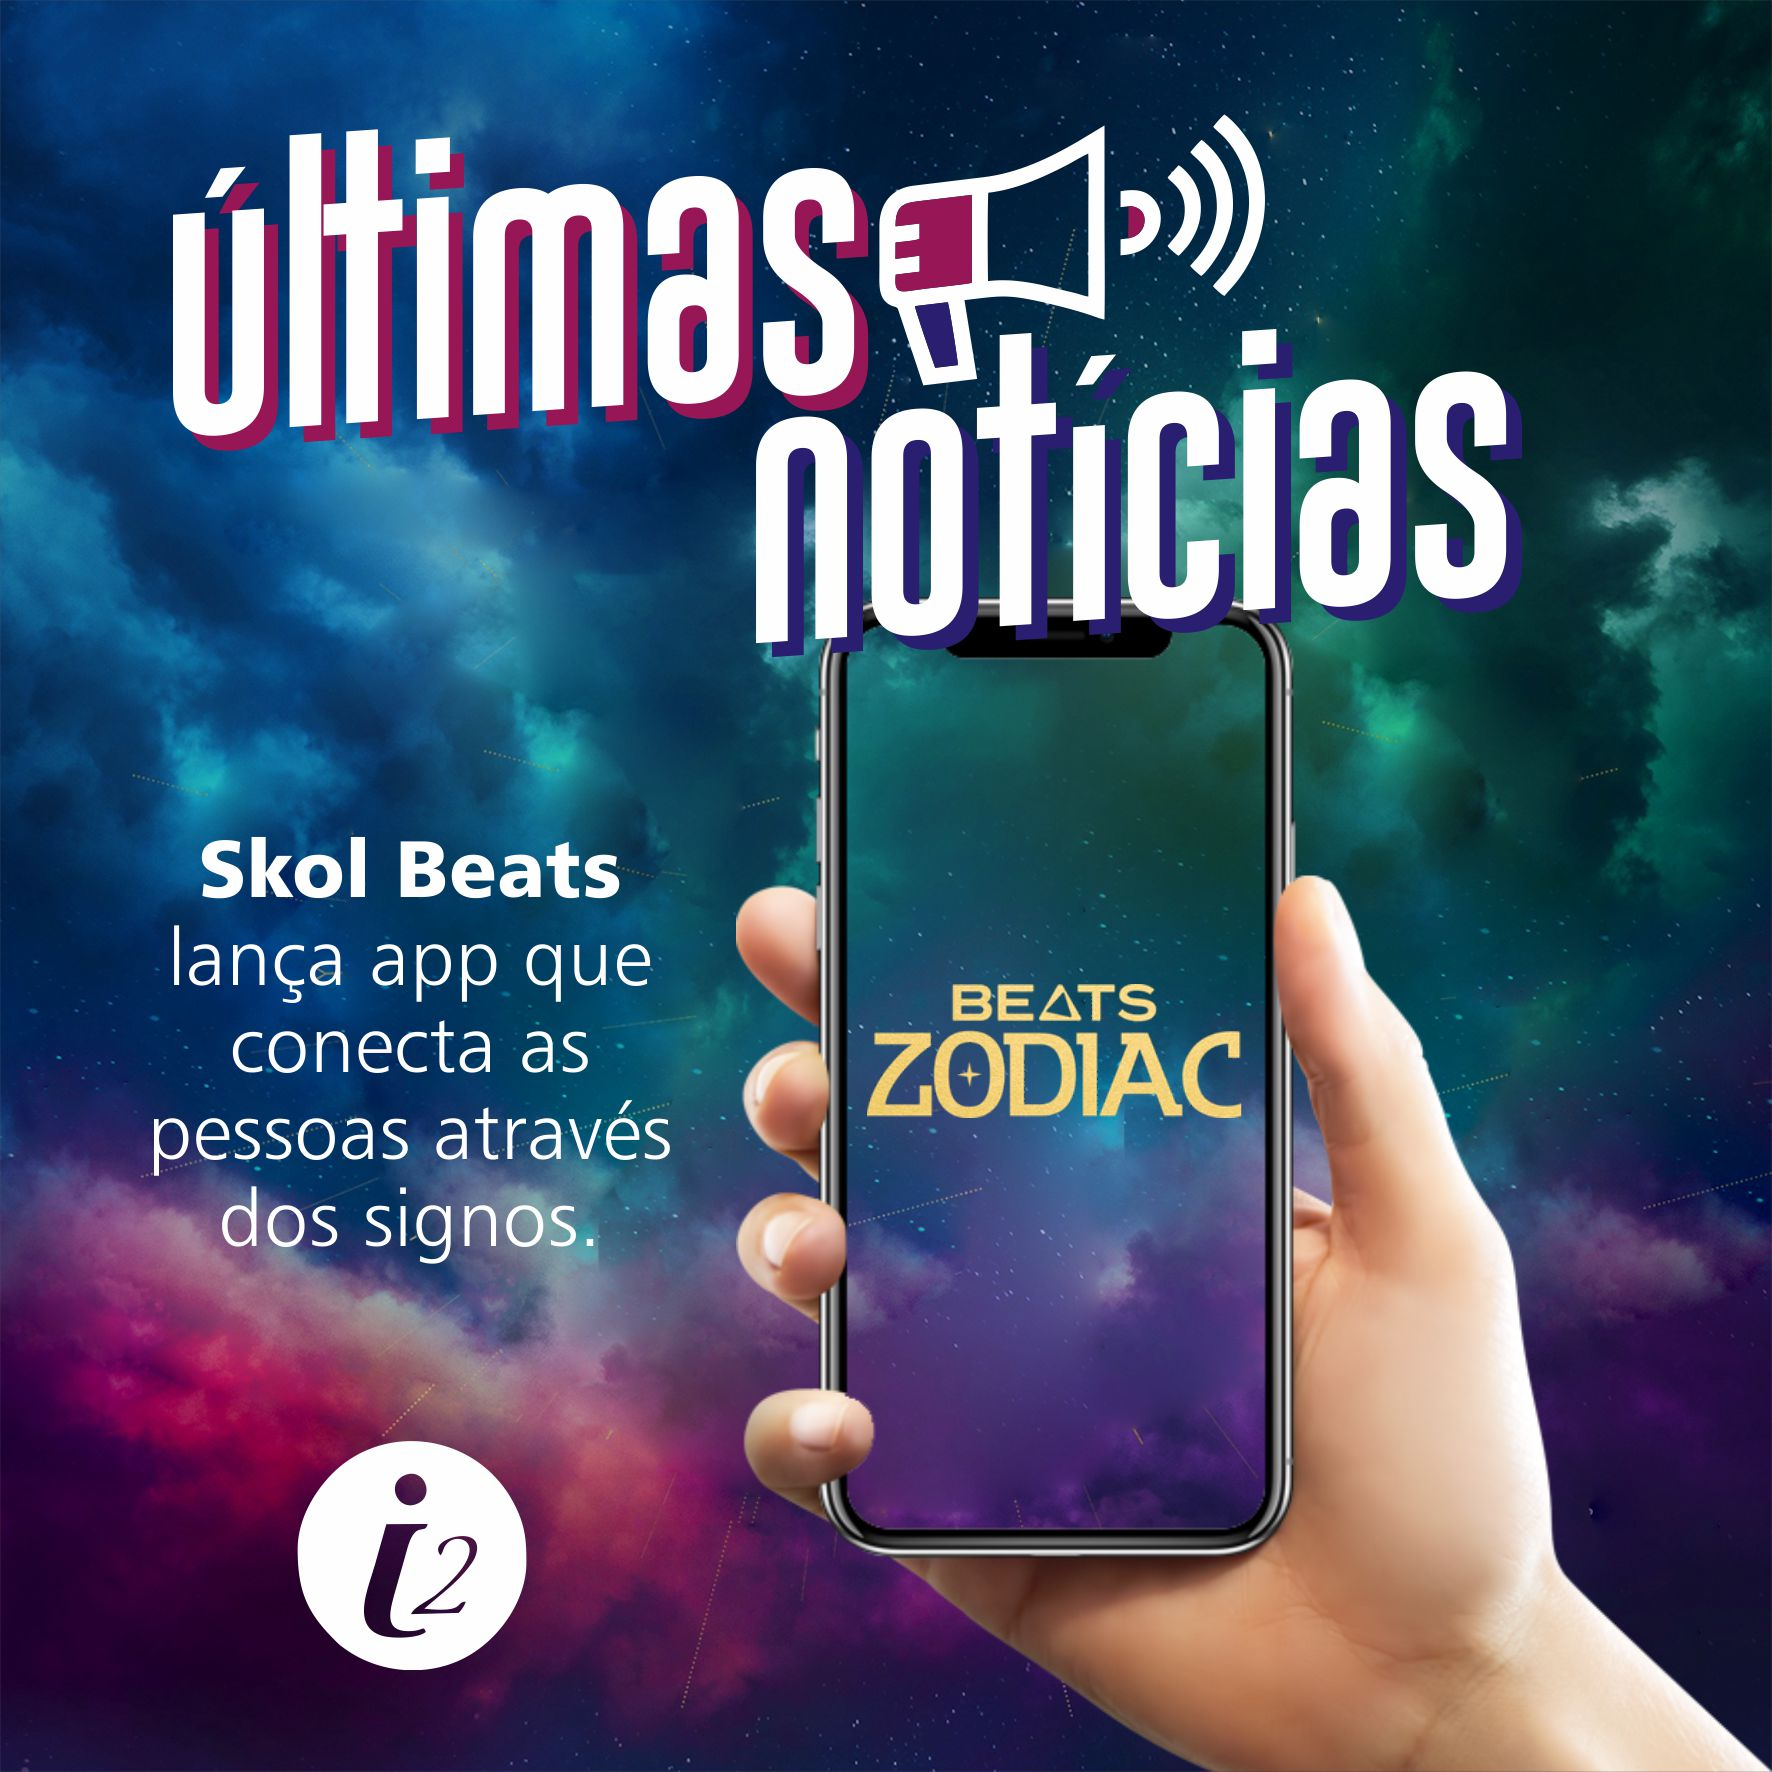 Conexão Beats: A nova sacada de marketing da Skol Beats